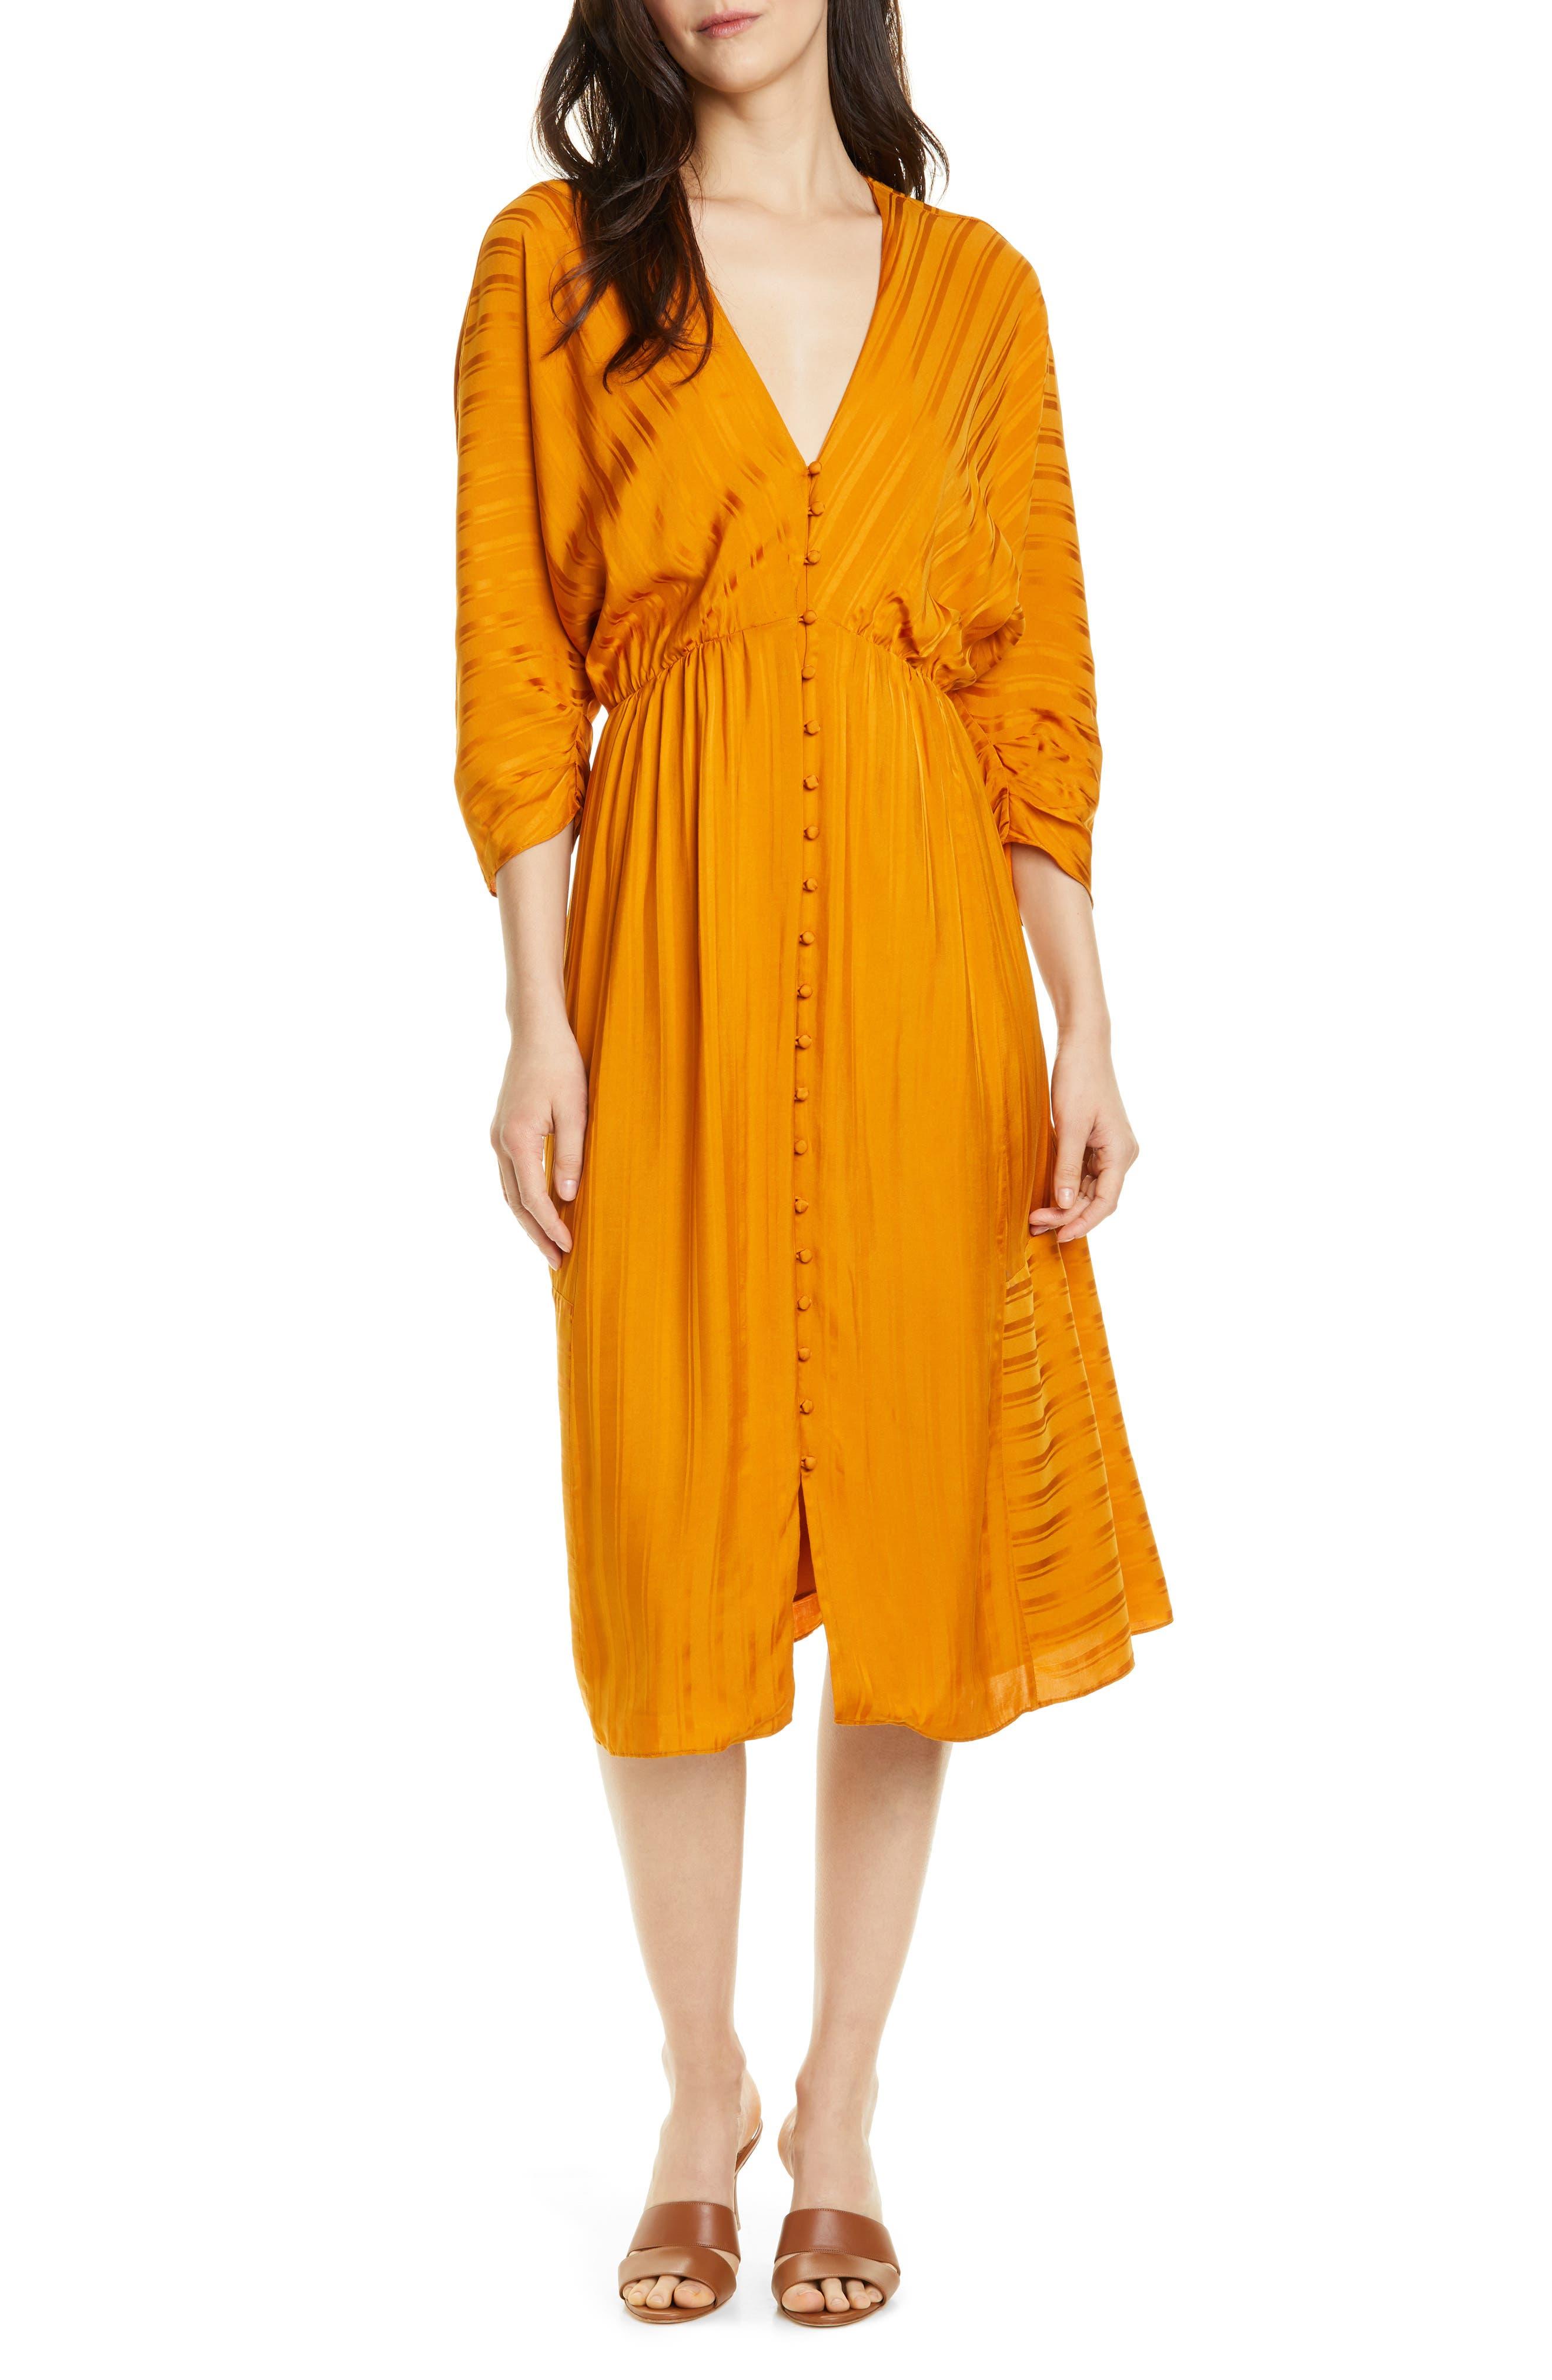 Joie Brit Dolman Sleeve Dress, Brown